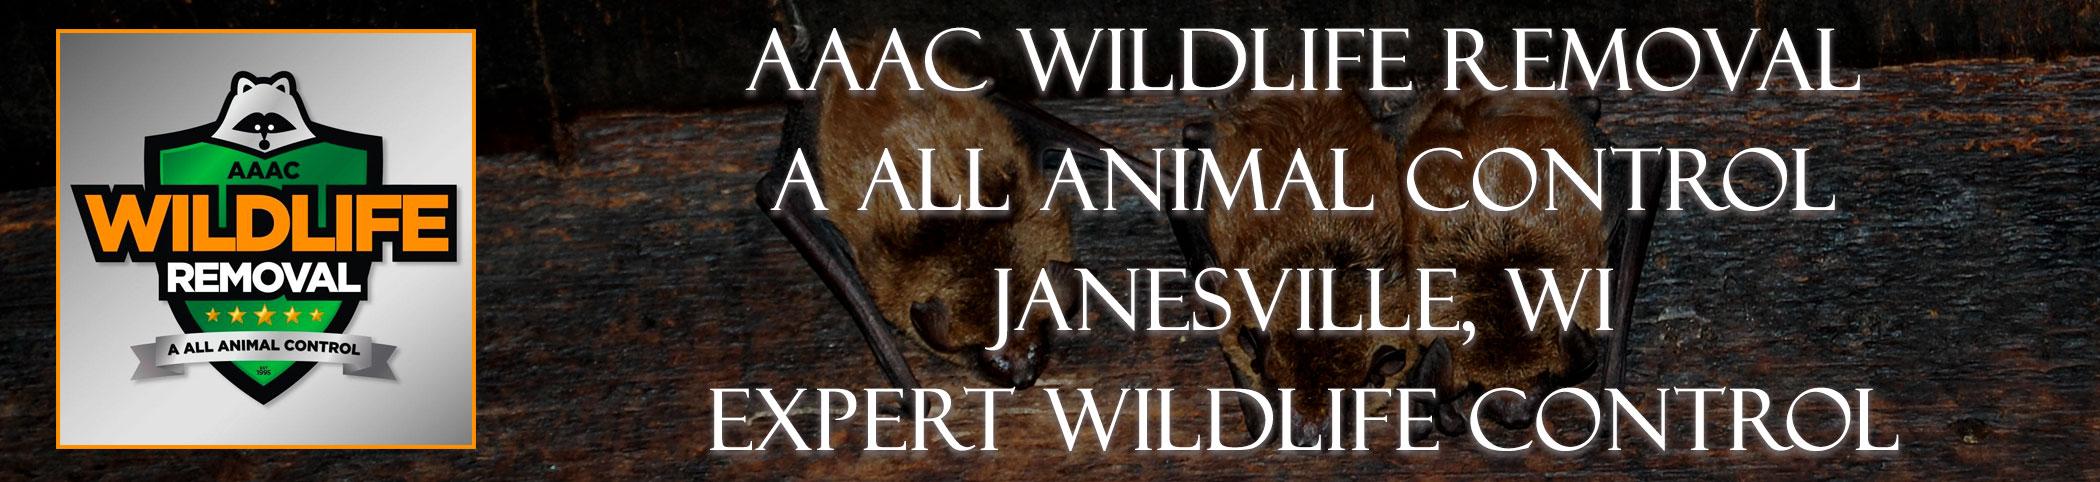 aaac-wildlife-removal-Janesville-wisconsin